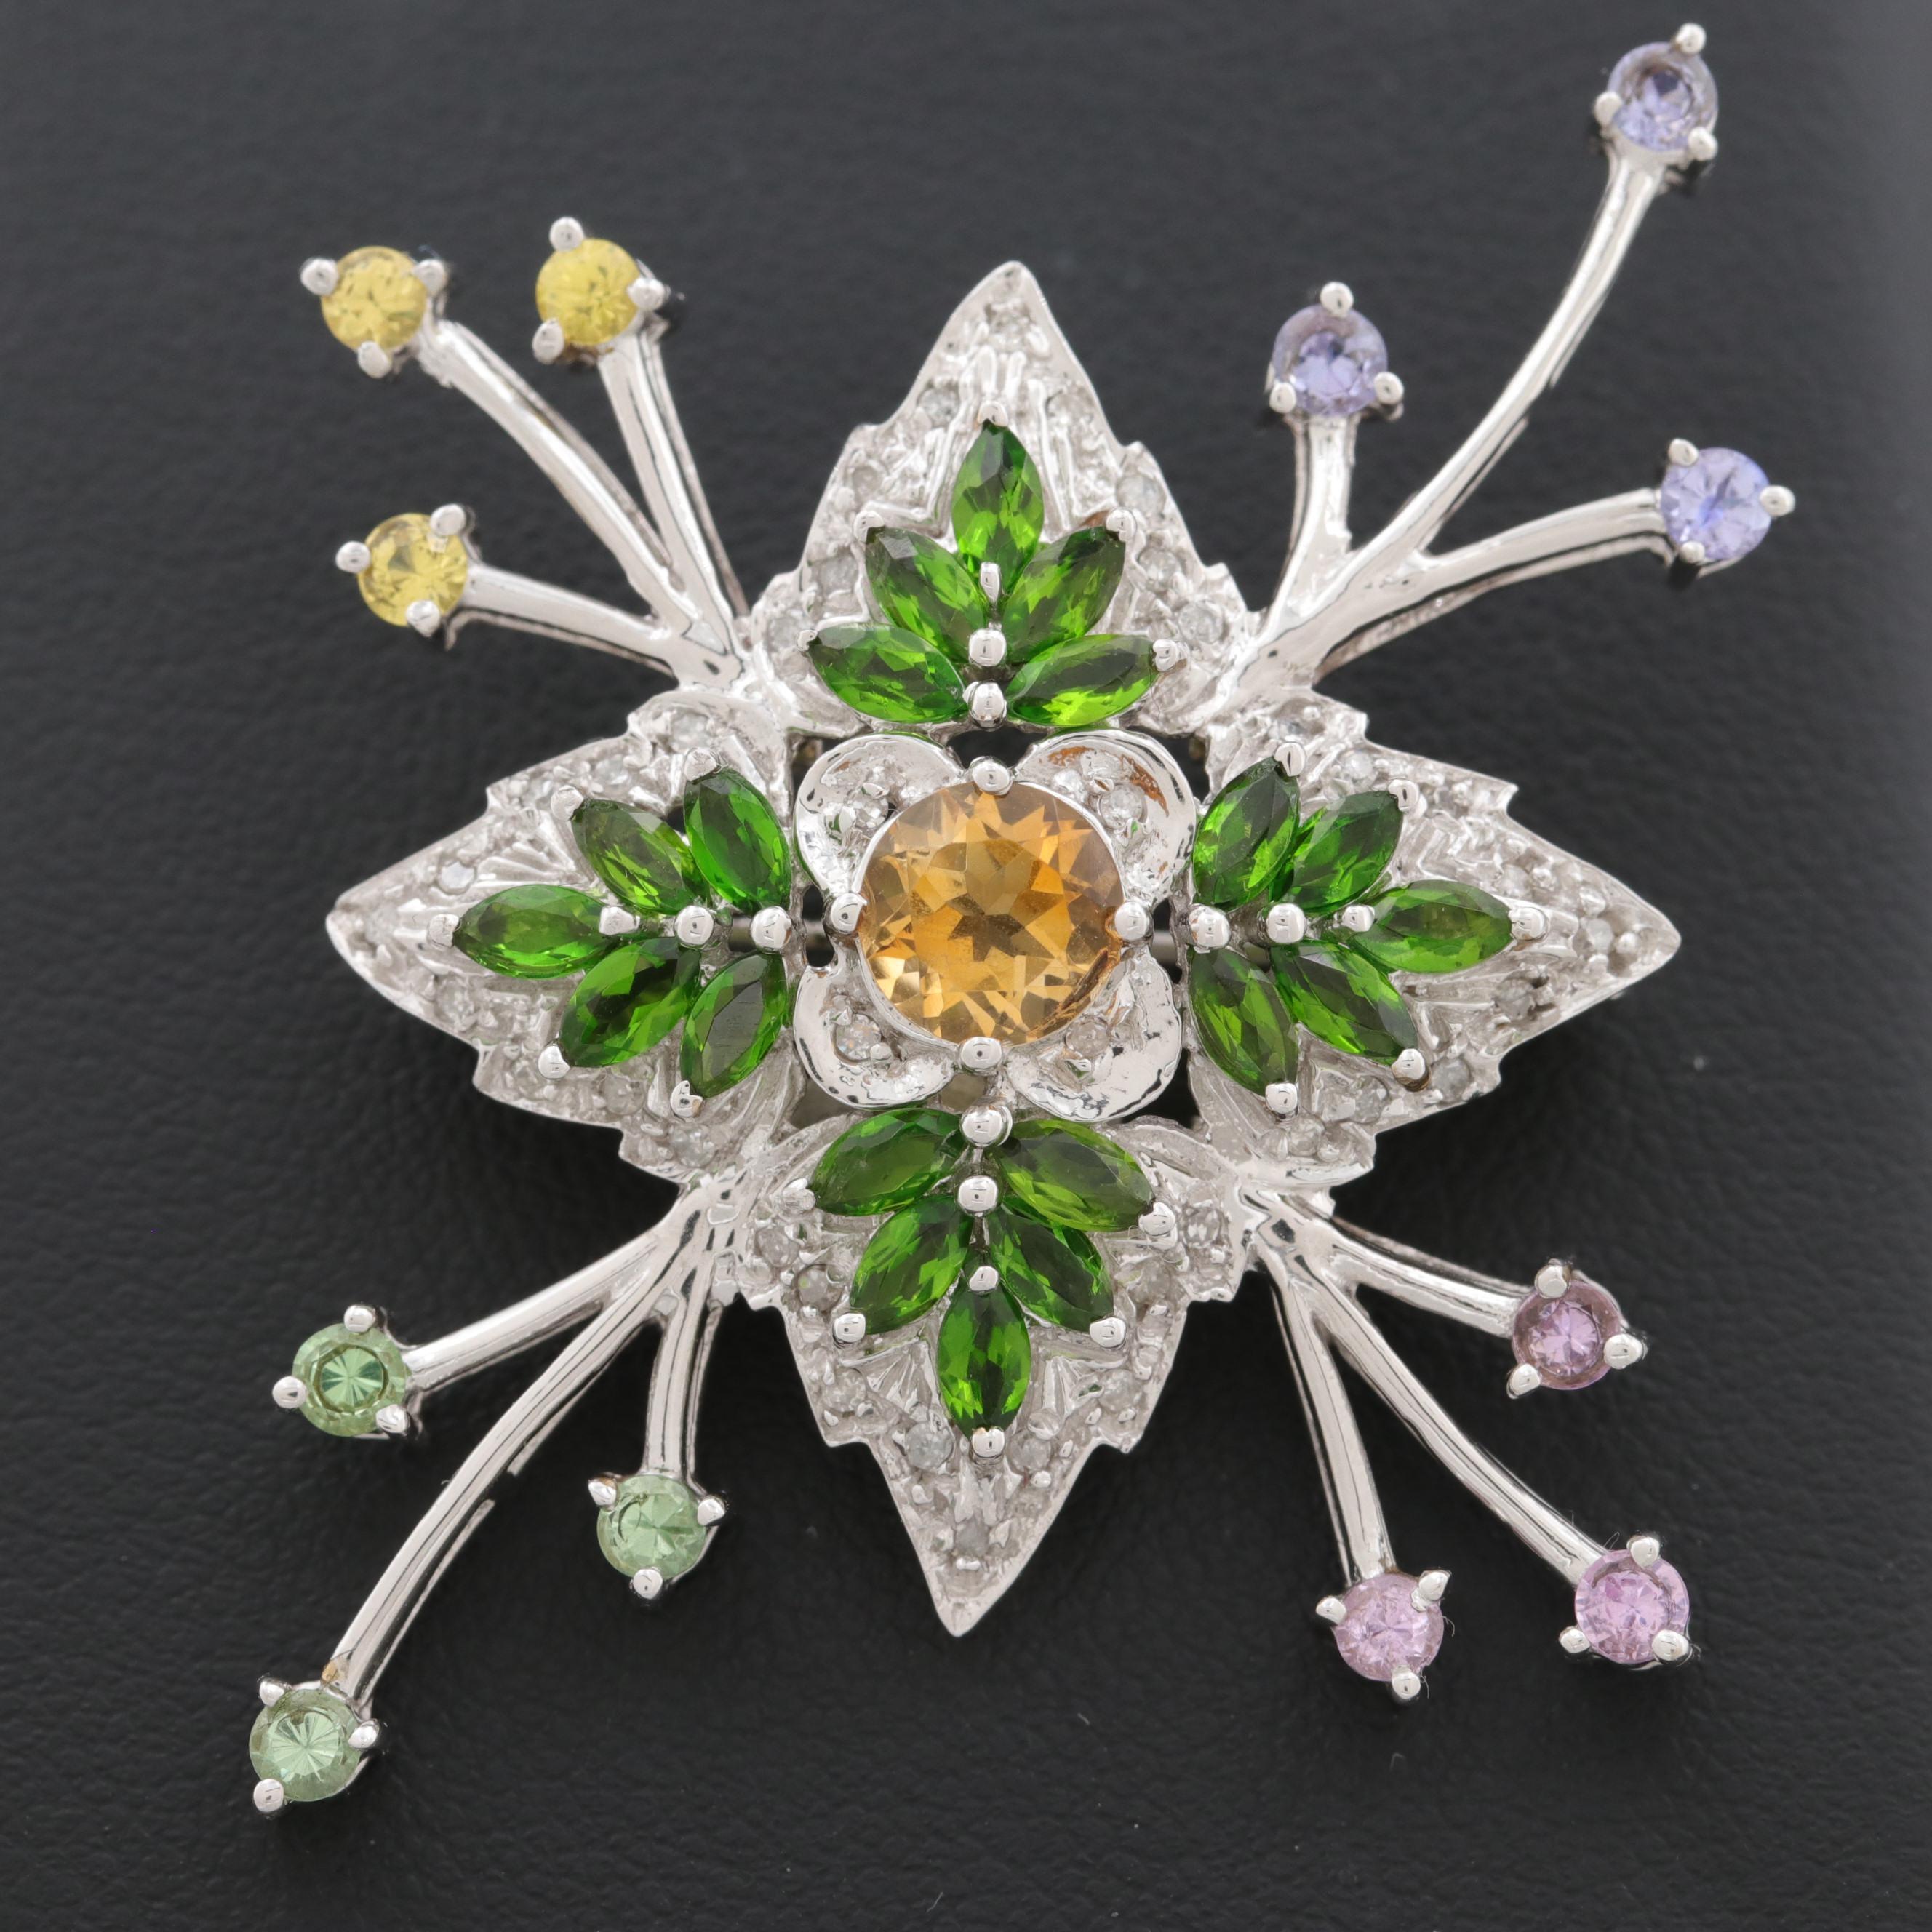 14K White Gold Diamond and Multi-Gemstone Brooch